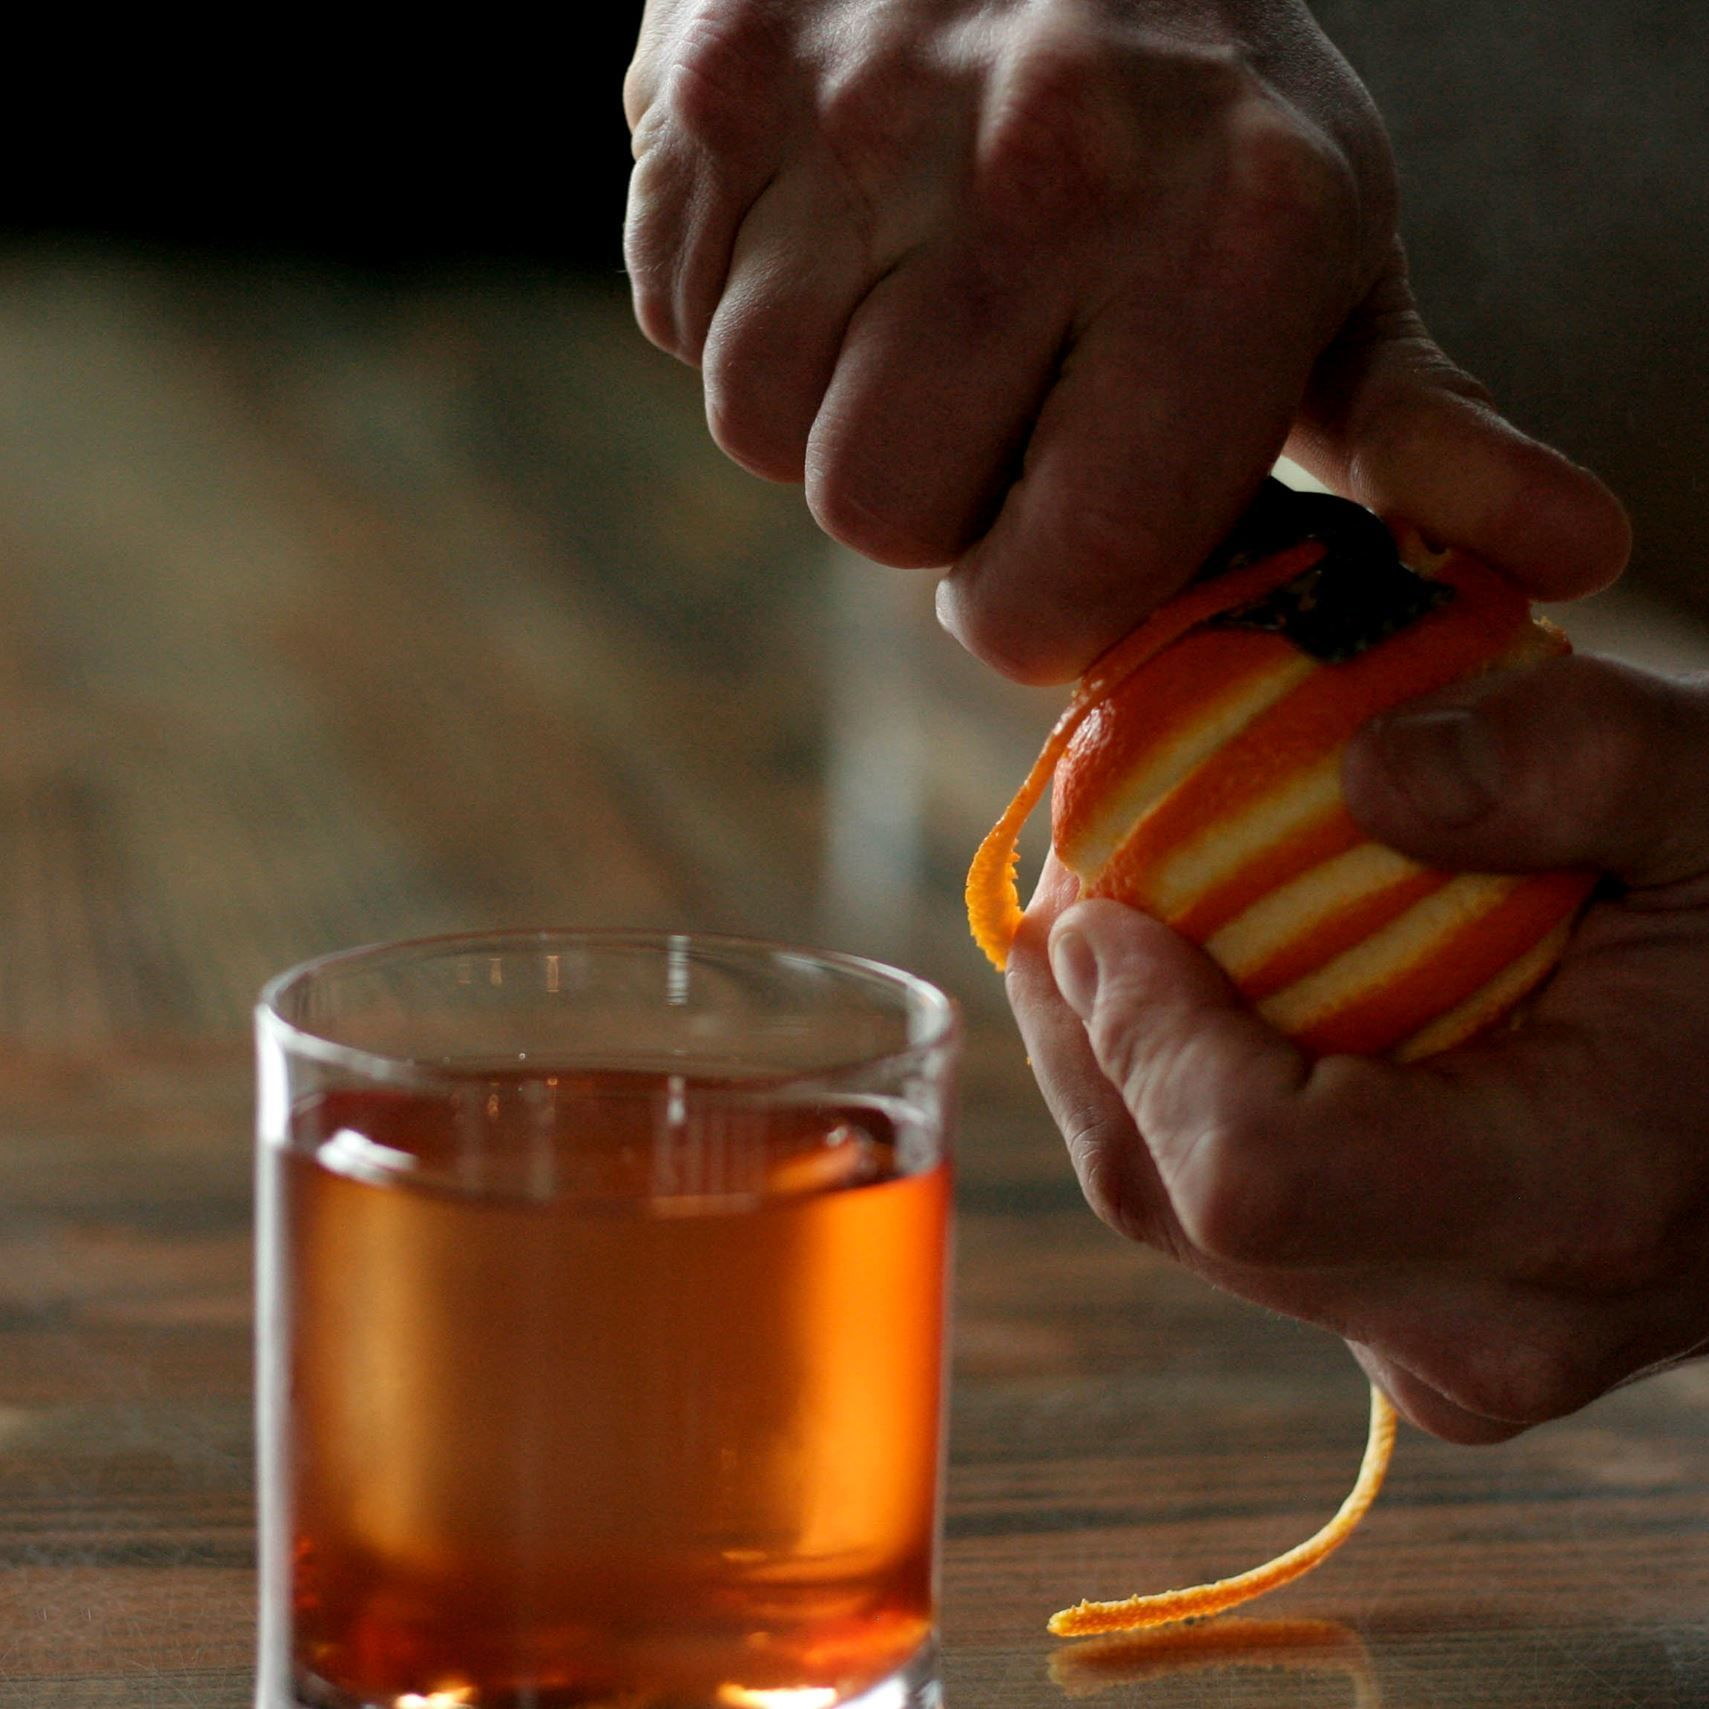 Old fashioned cocktail joli 3 eycimd